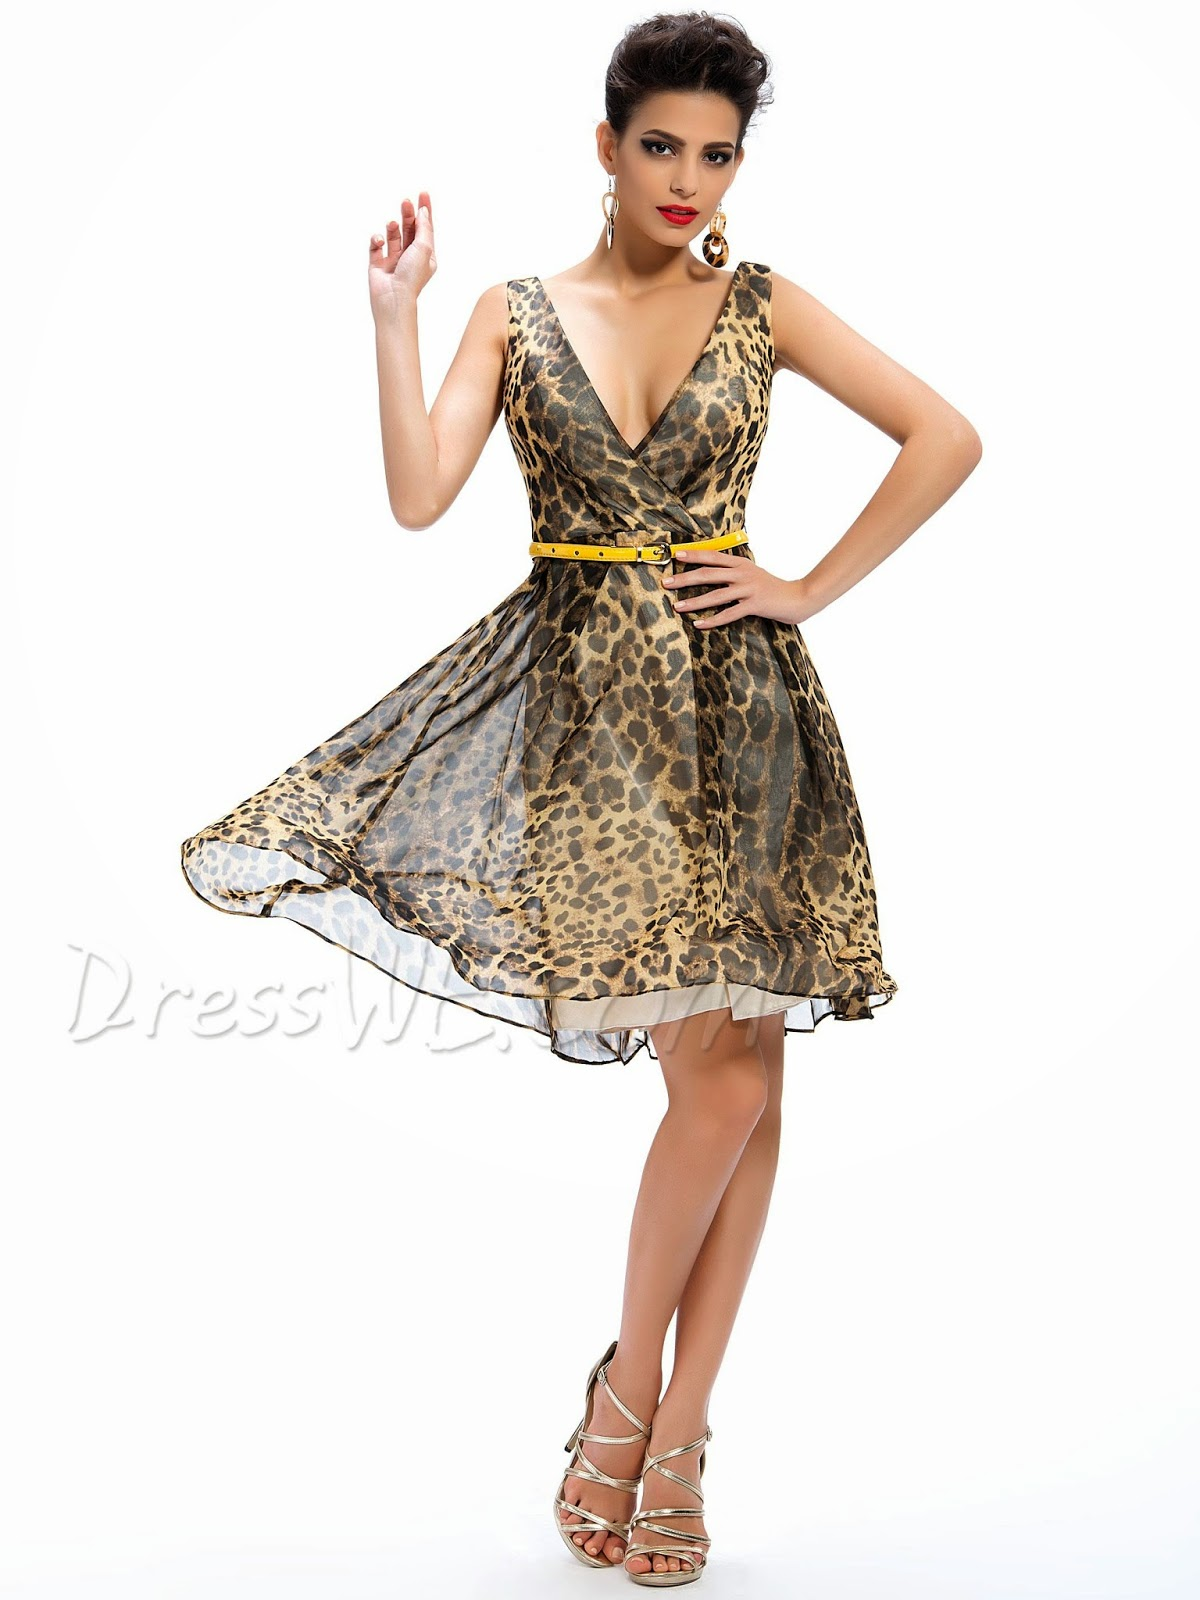 http://www.dresswe.com/item/10994647.html